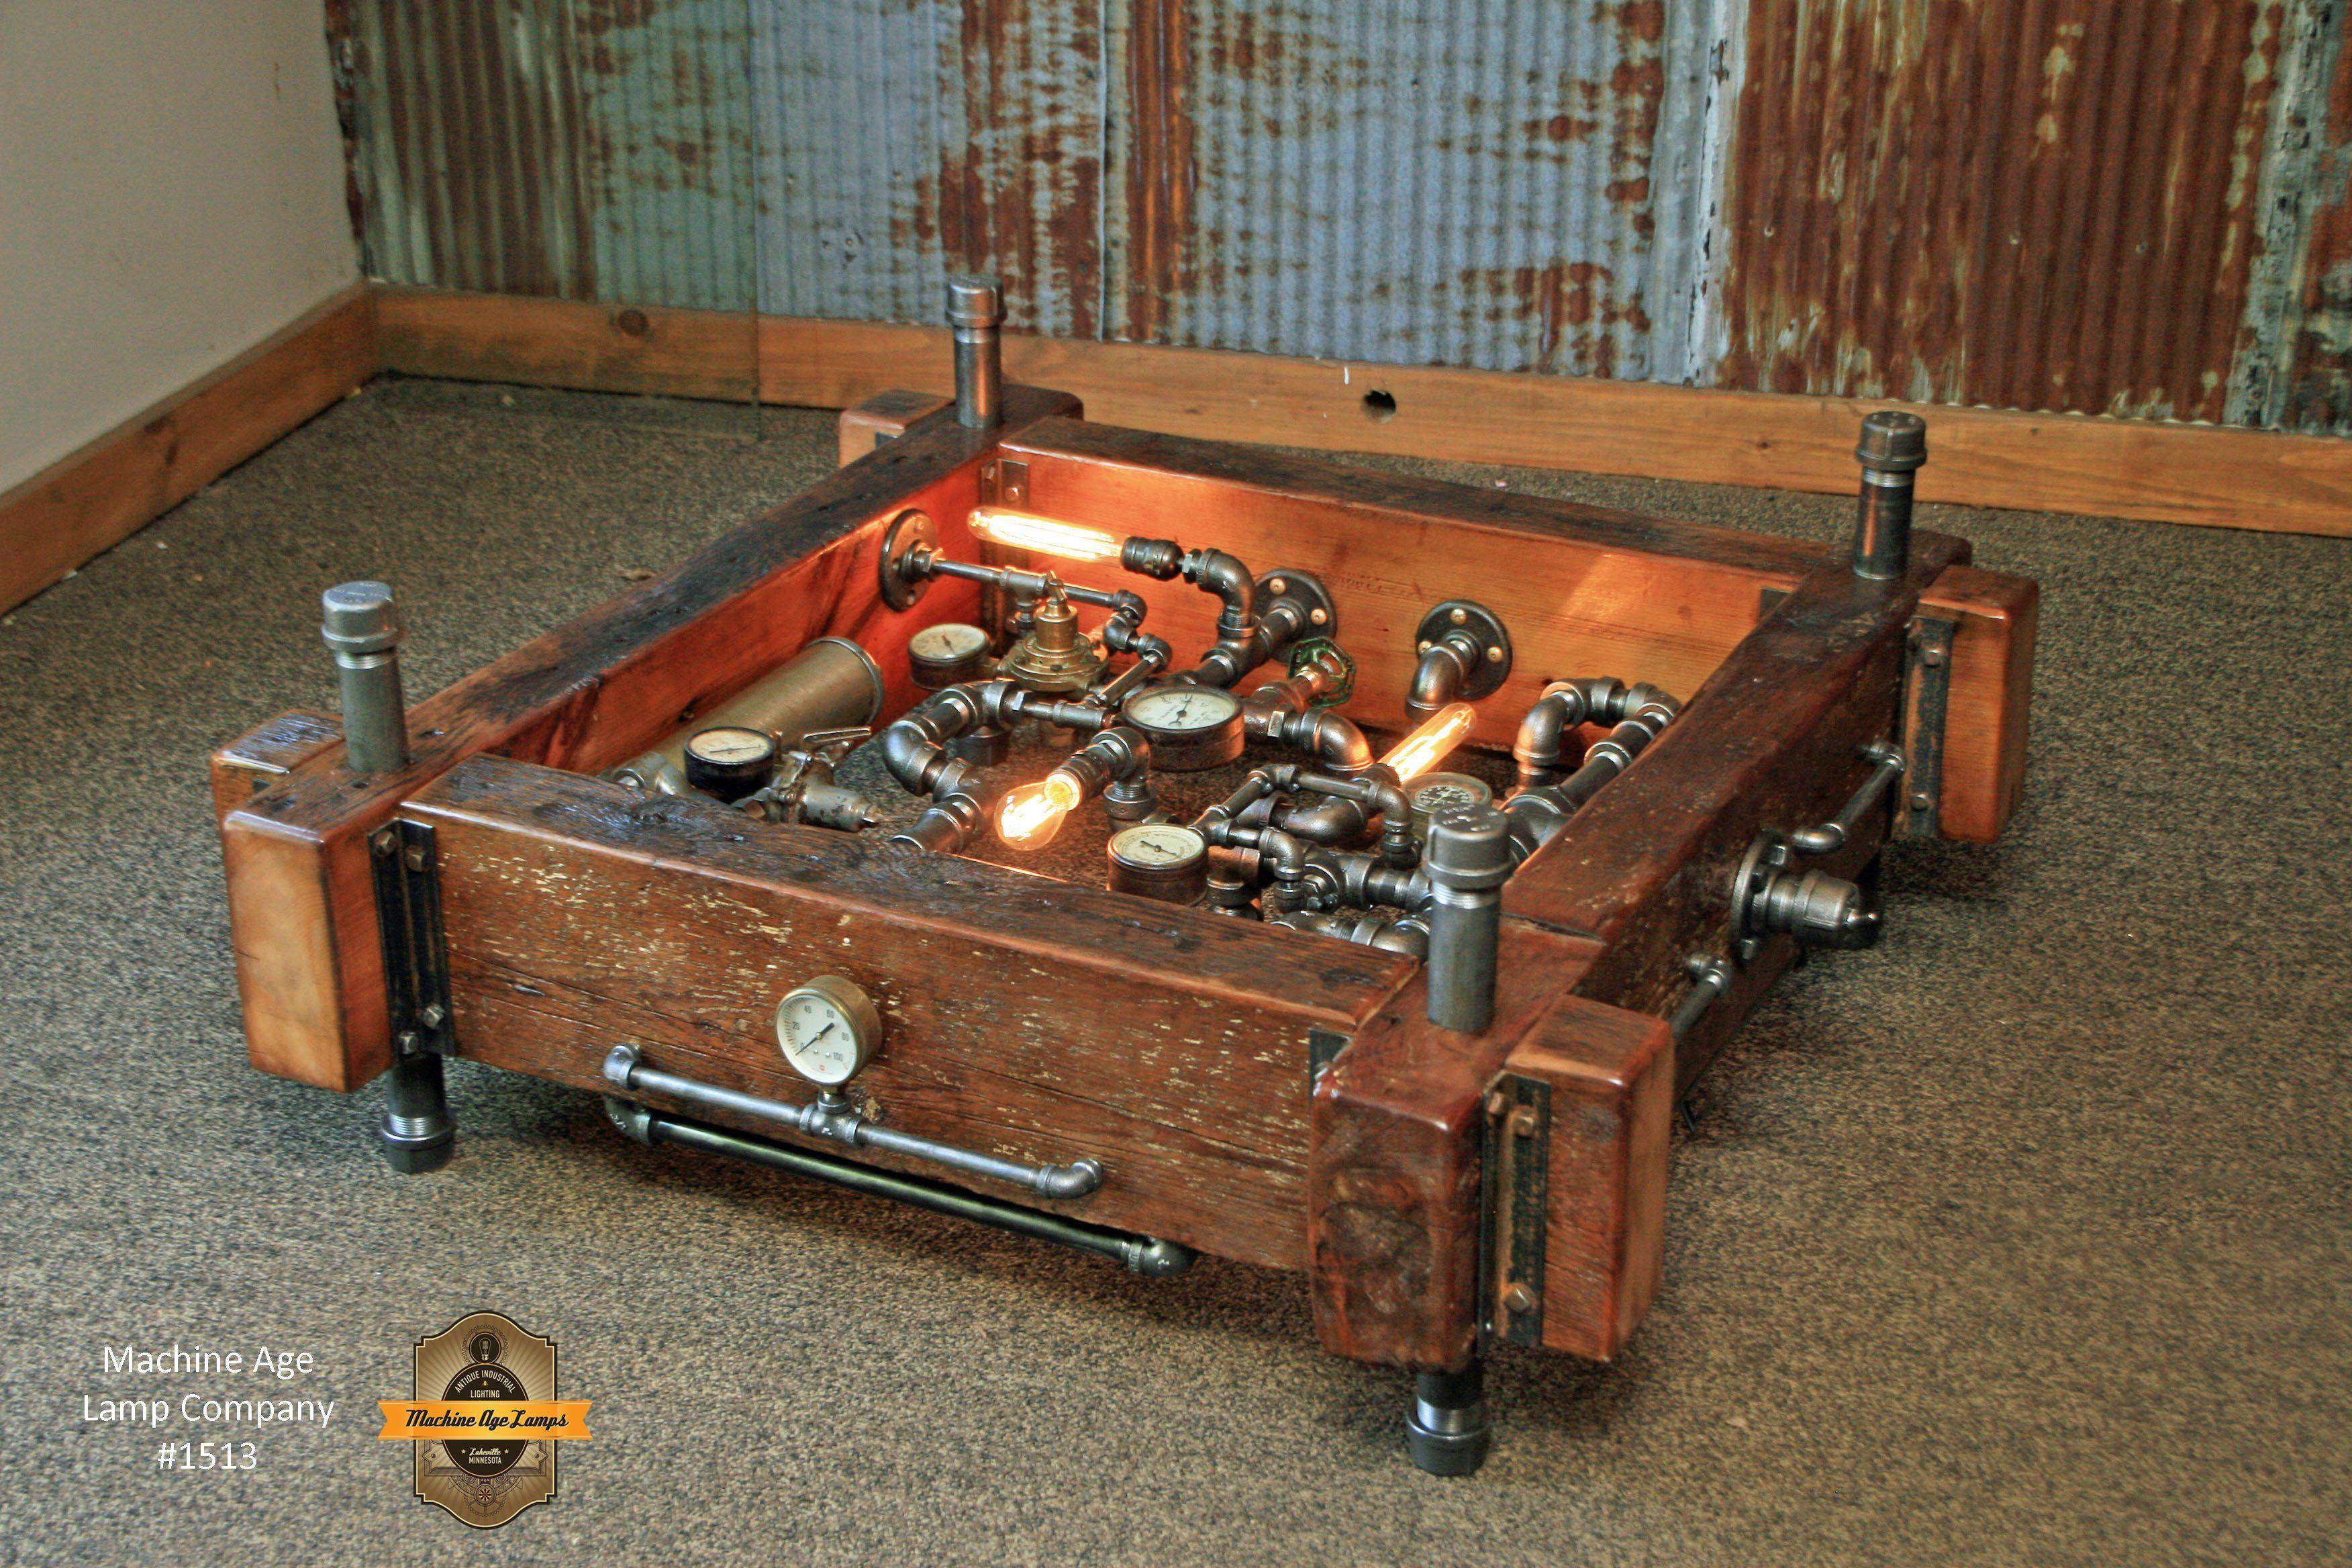 Steampunk Industrial Table Coffee Barn Wood Gauges Table 1513 Vintage Industrial Furniture Vintage Industrial Decor Industrial Furniture